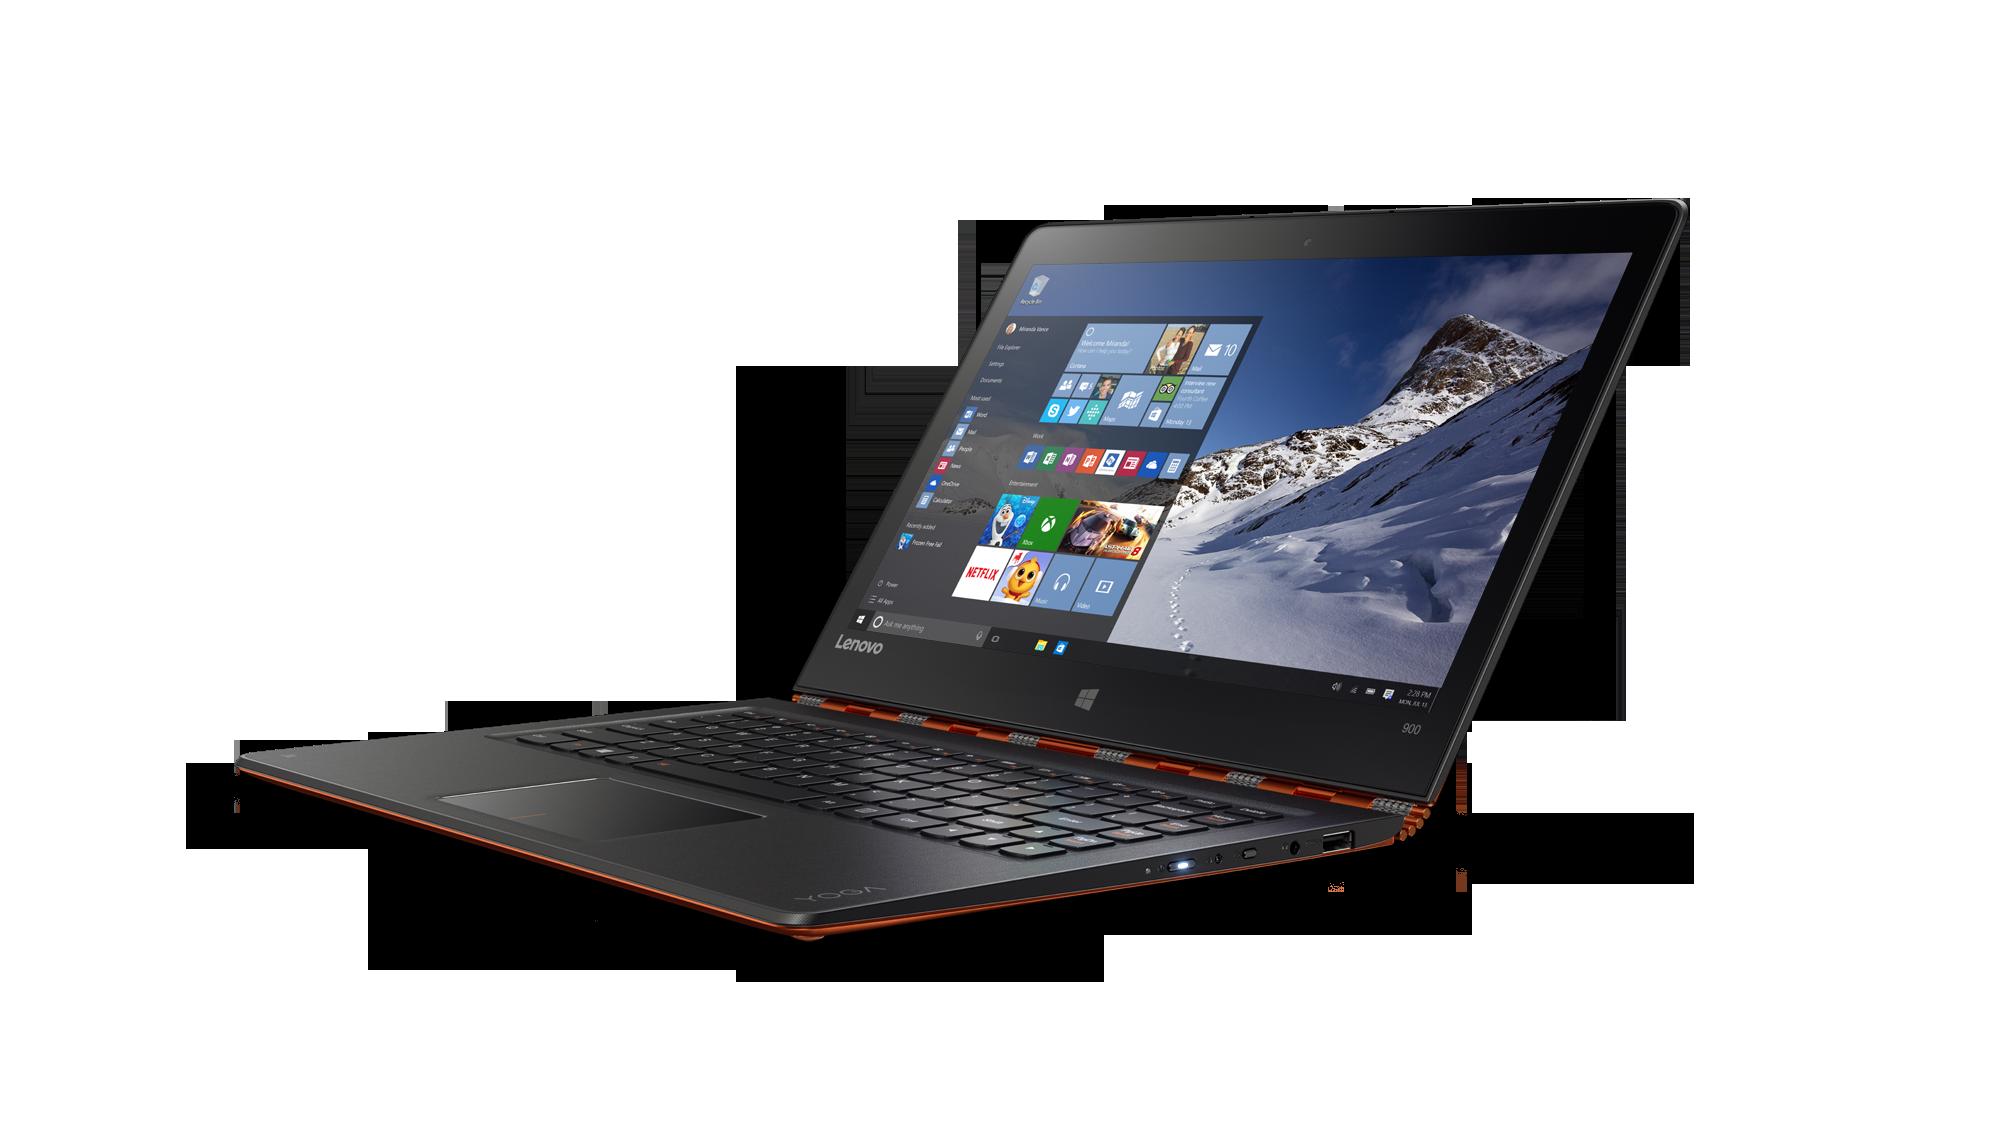 "Lenovo YOGA 900-13ISK i5-6200U 2,80GHz/8GB/SSD 256GB/13,3"" QHD+/IPS/multitouch/WIN10 oranžová 80MK00FVCK"